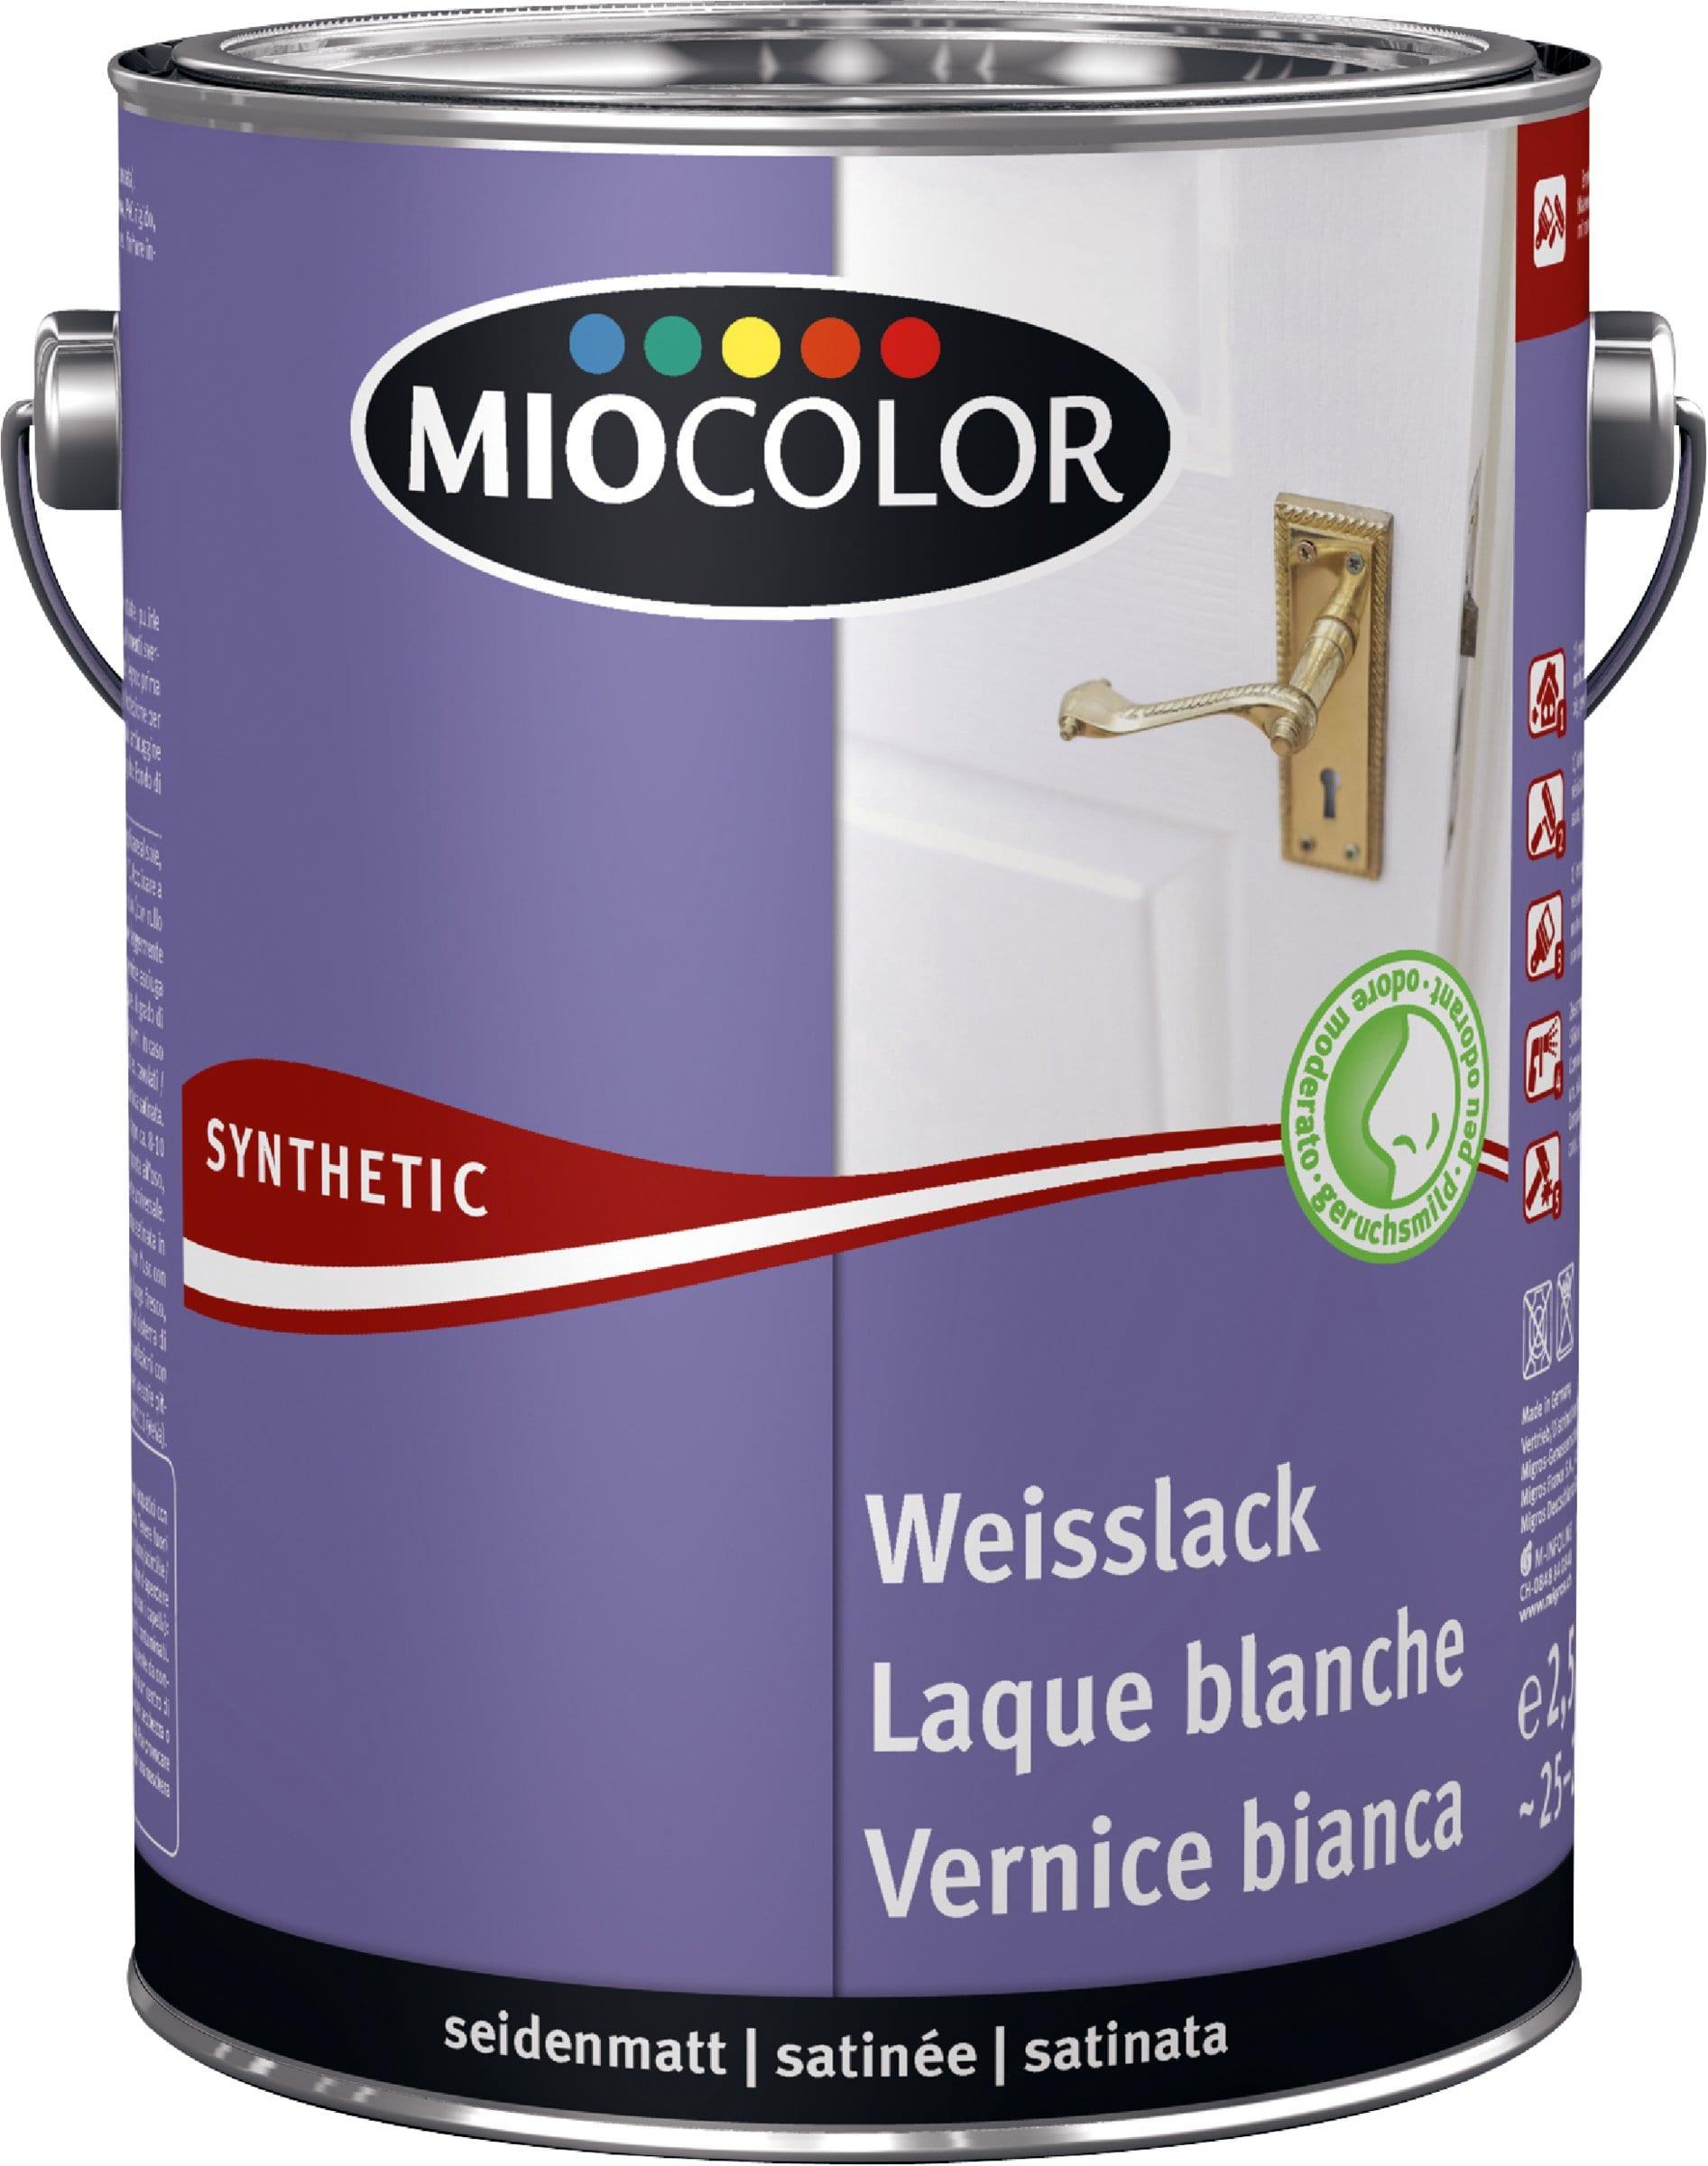 Pittura Resistente Ai Graffi miocolor vernice sintetica bianca satinata opaca bianco 2.5 l